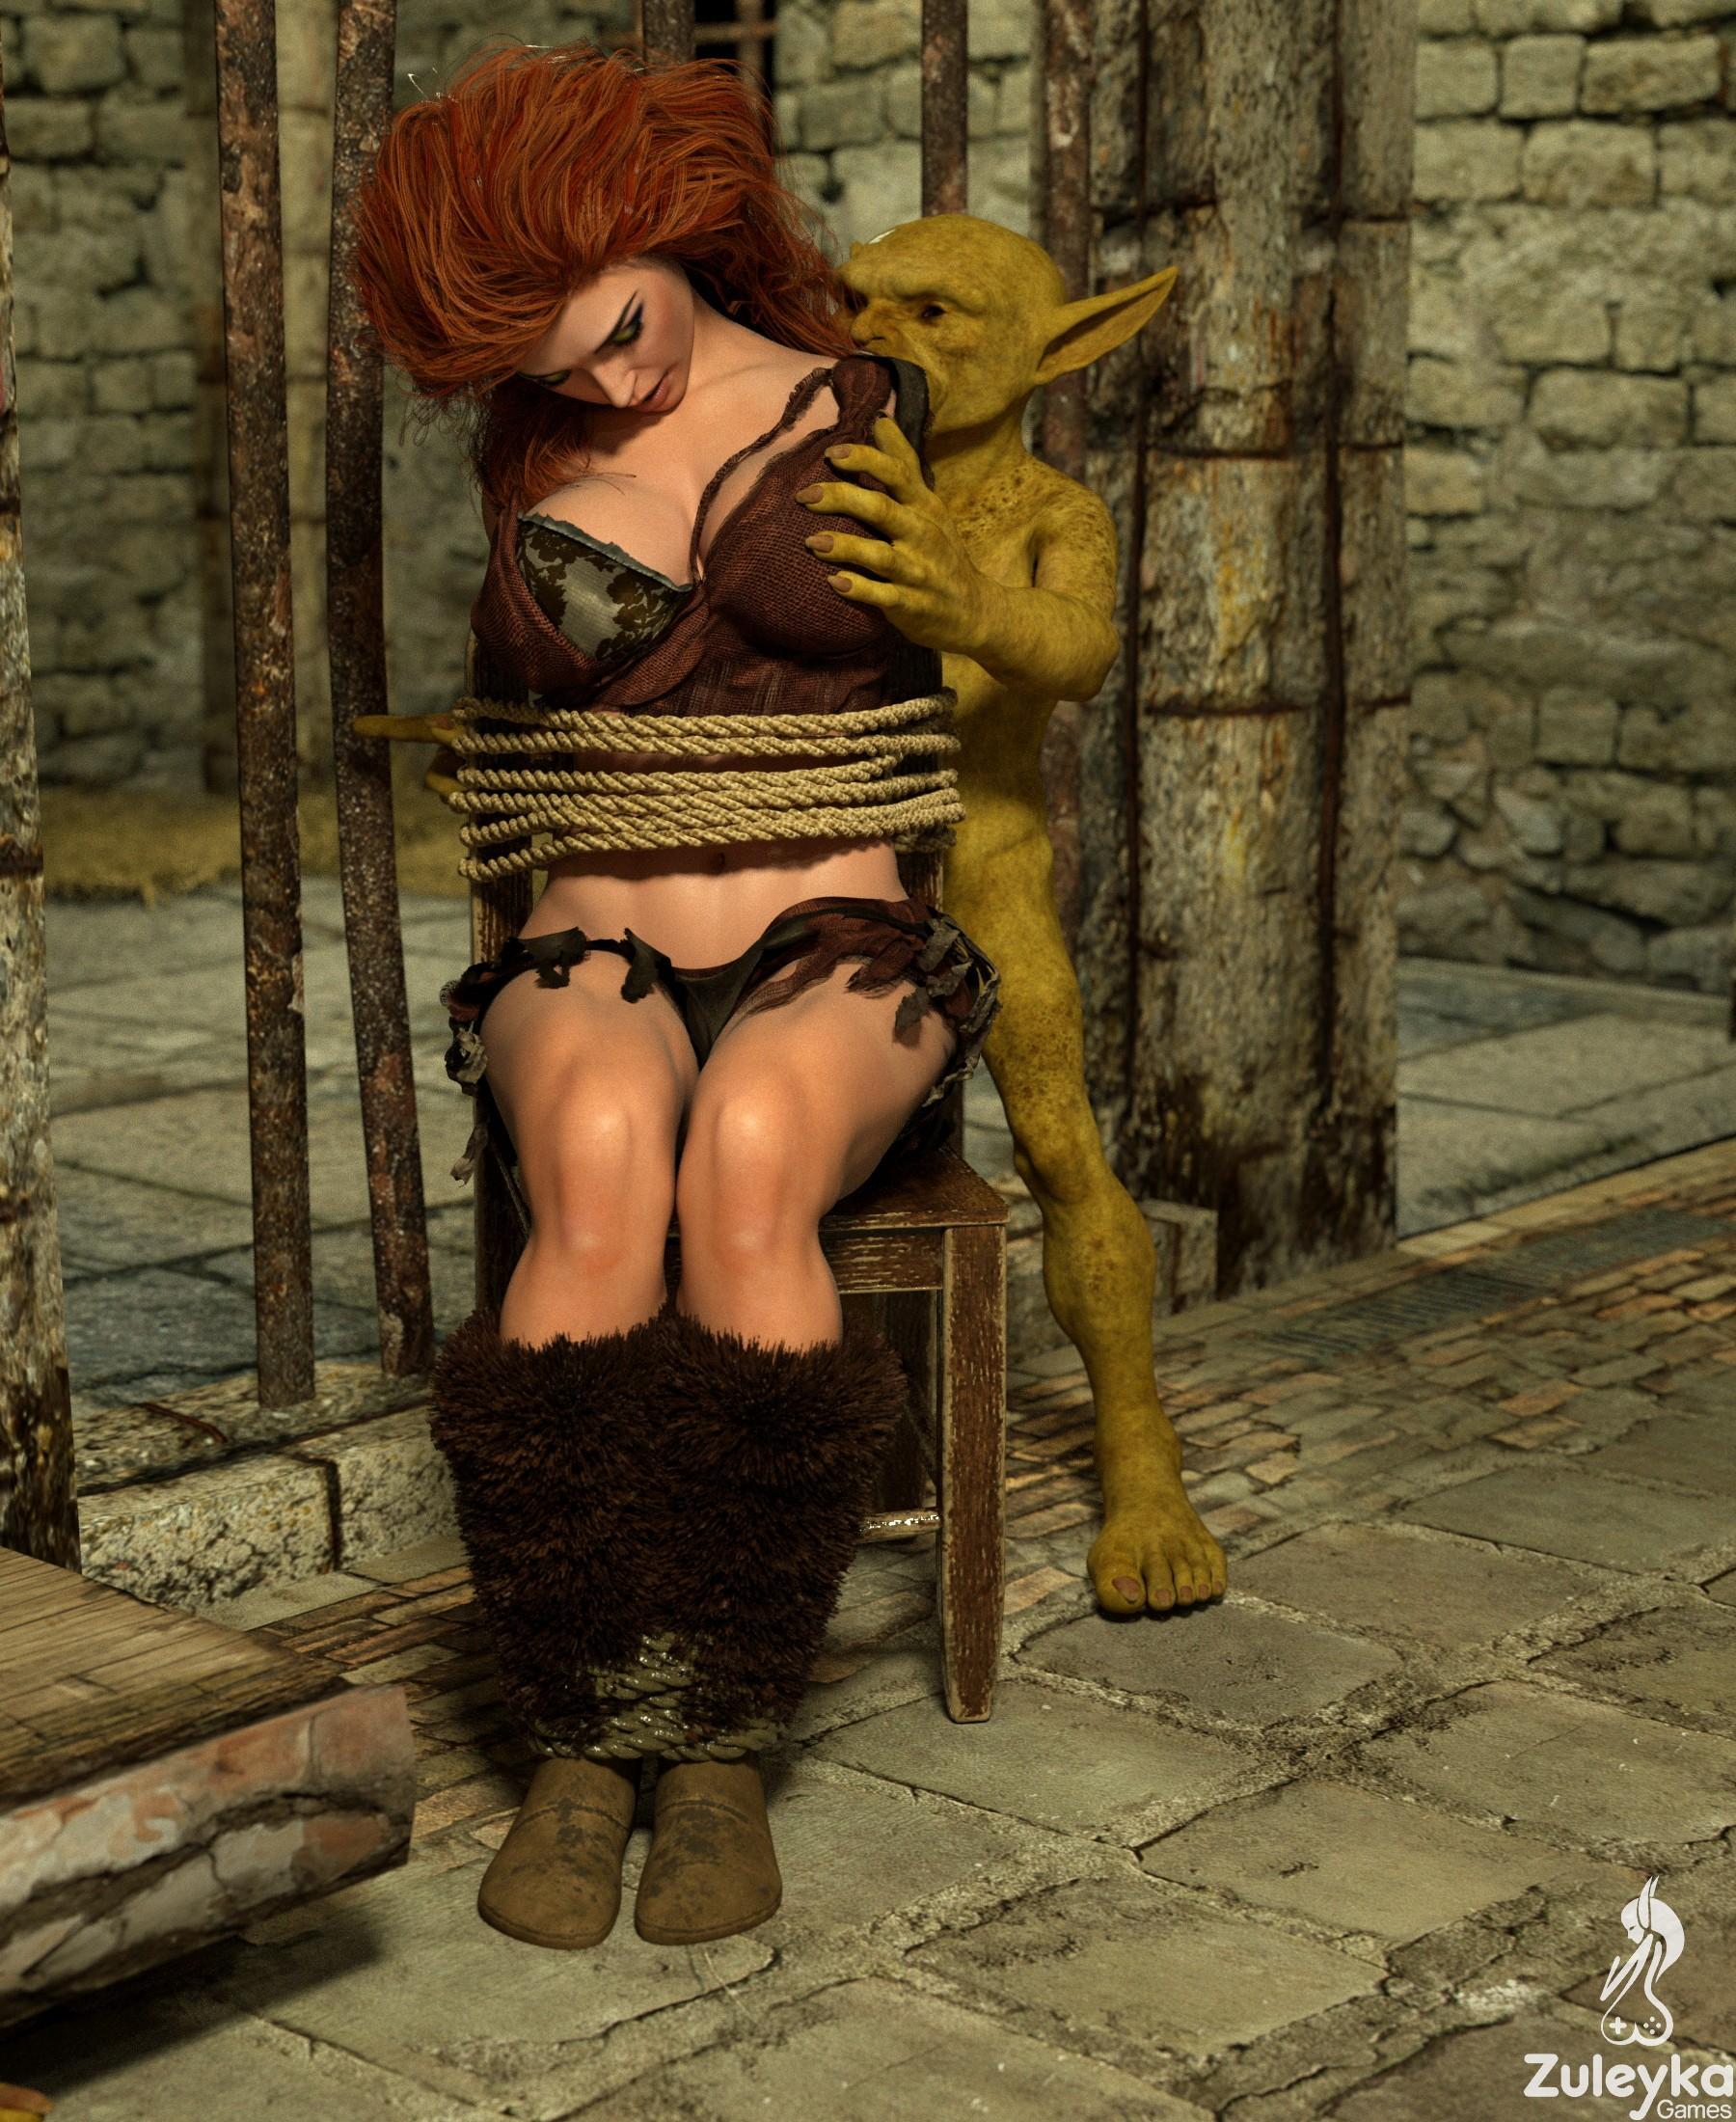 RED SONIA VS GOBLINS - Captured Sonia